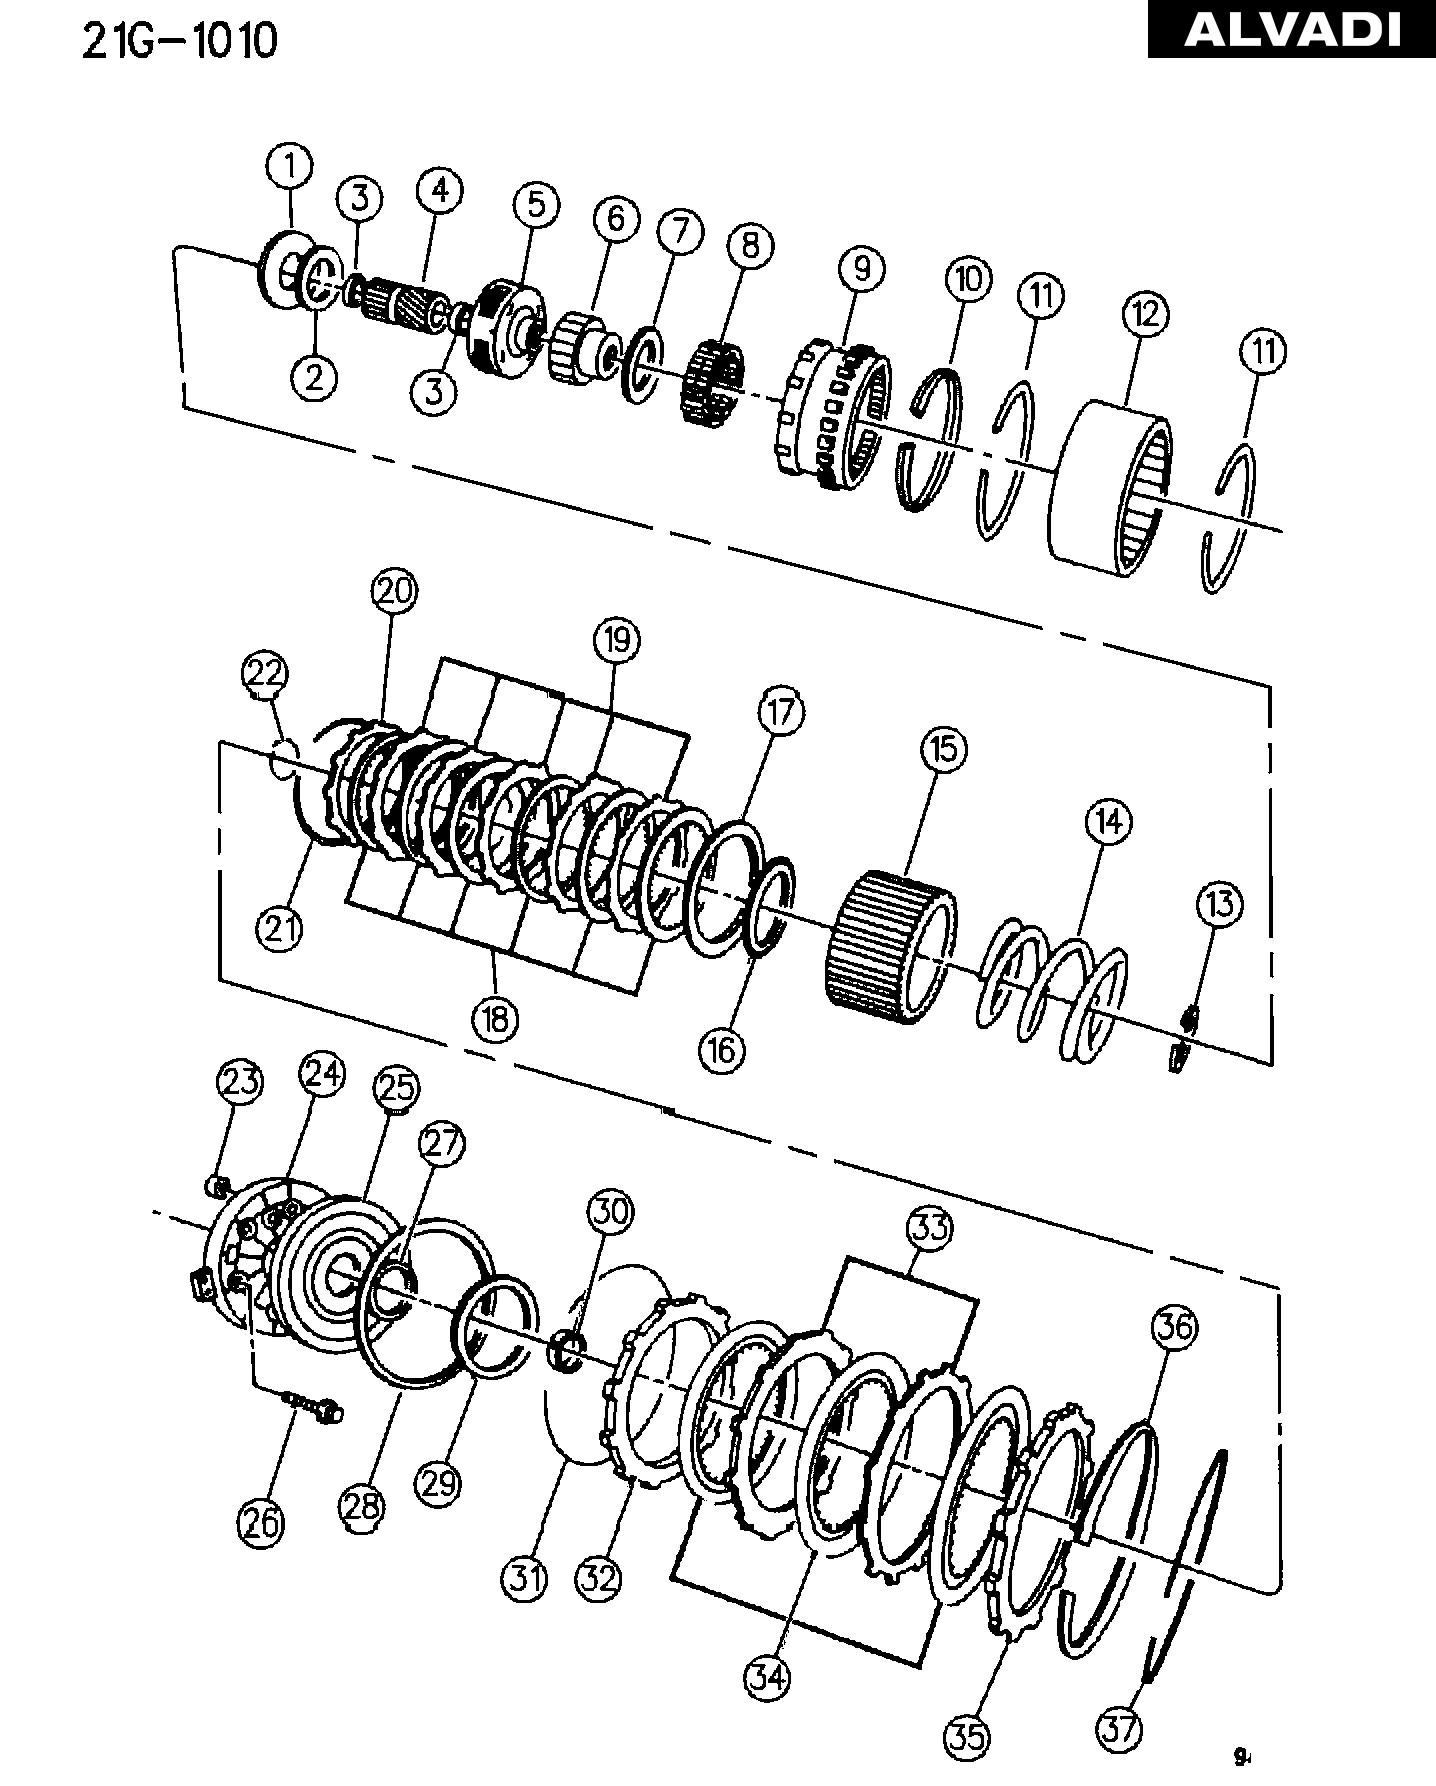 chevrolet s10 diagram manual